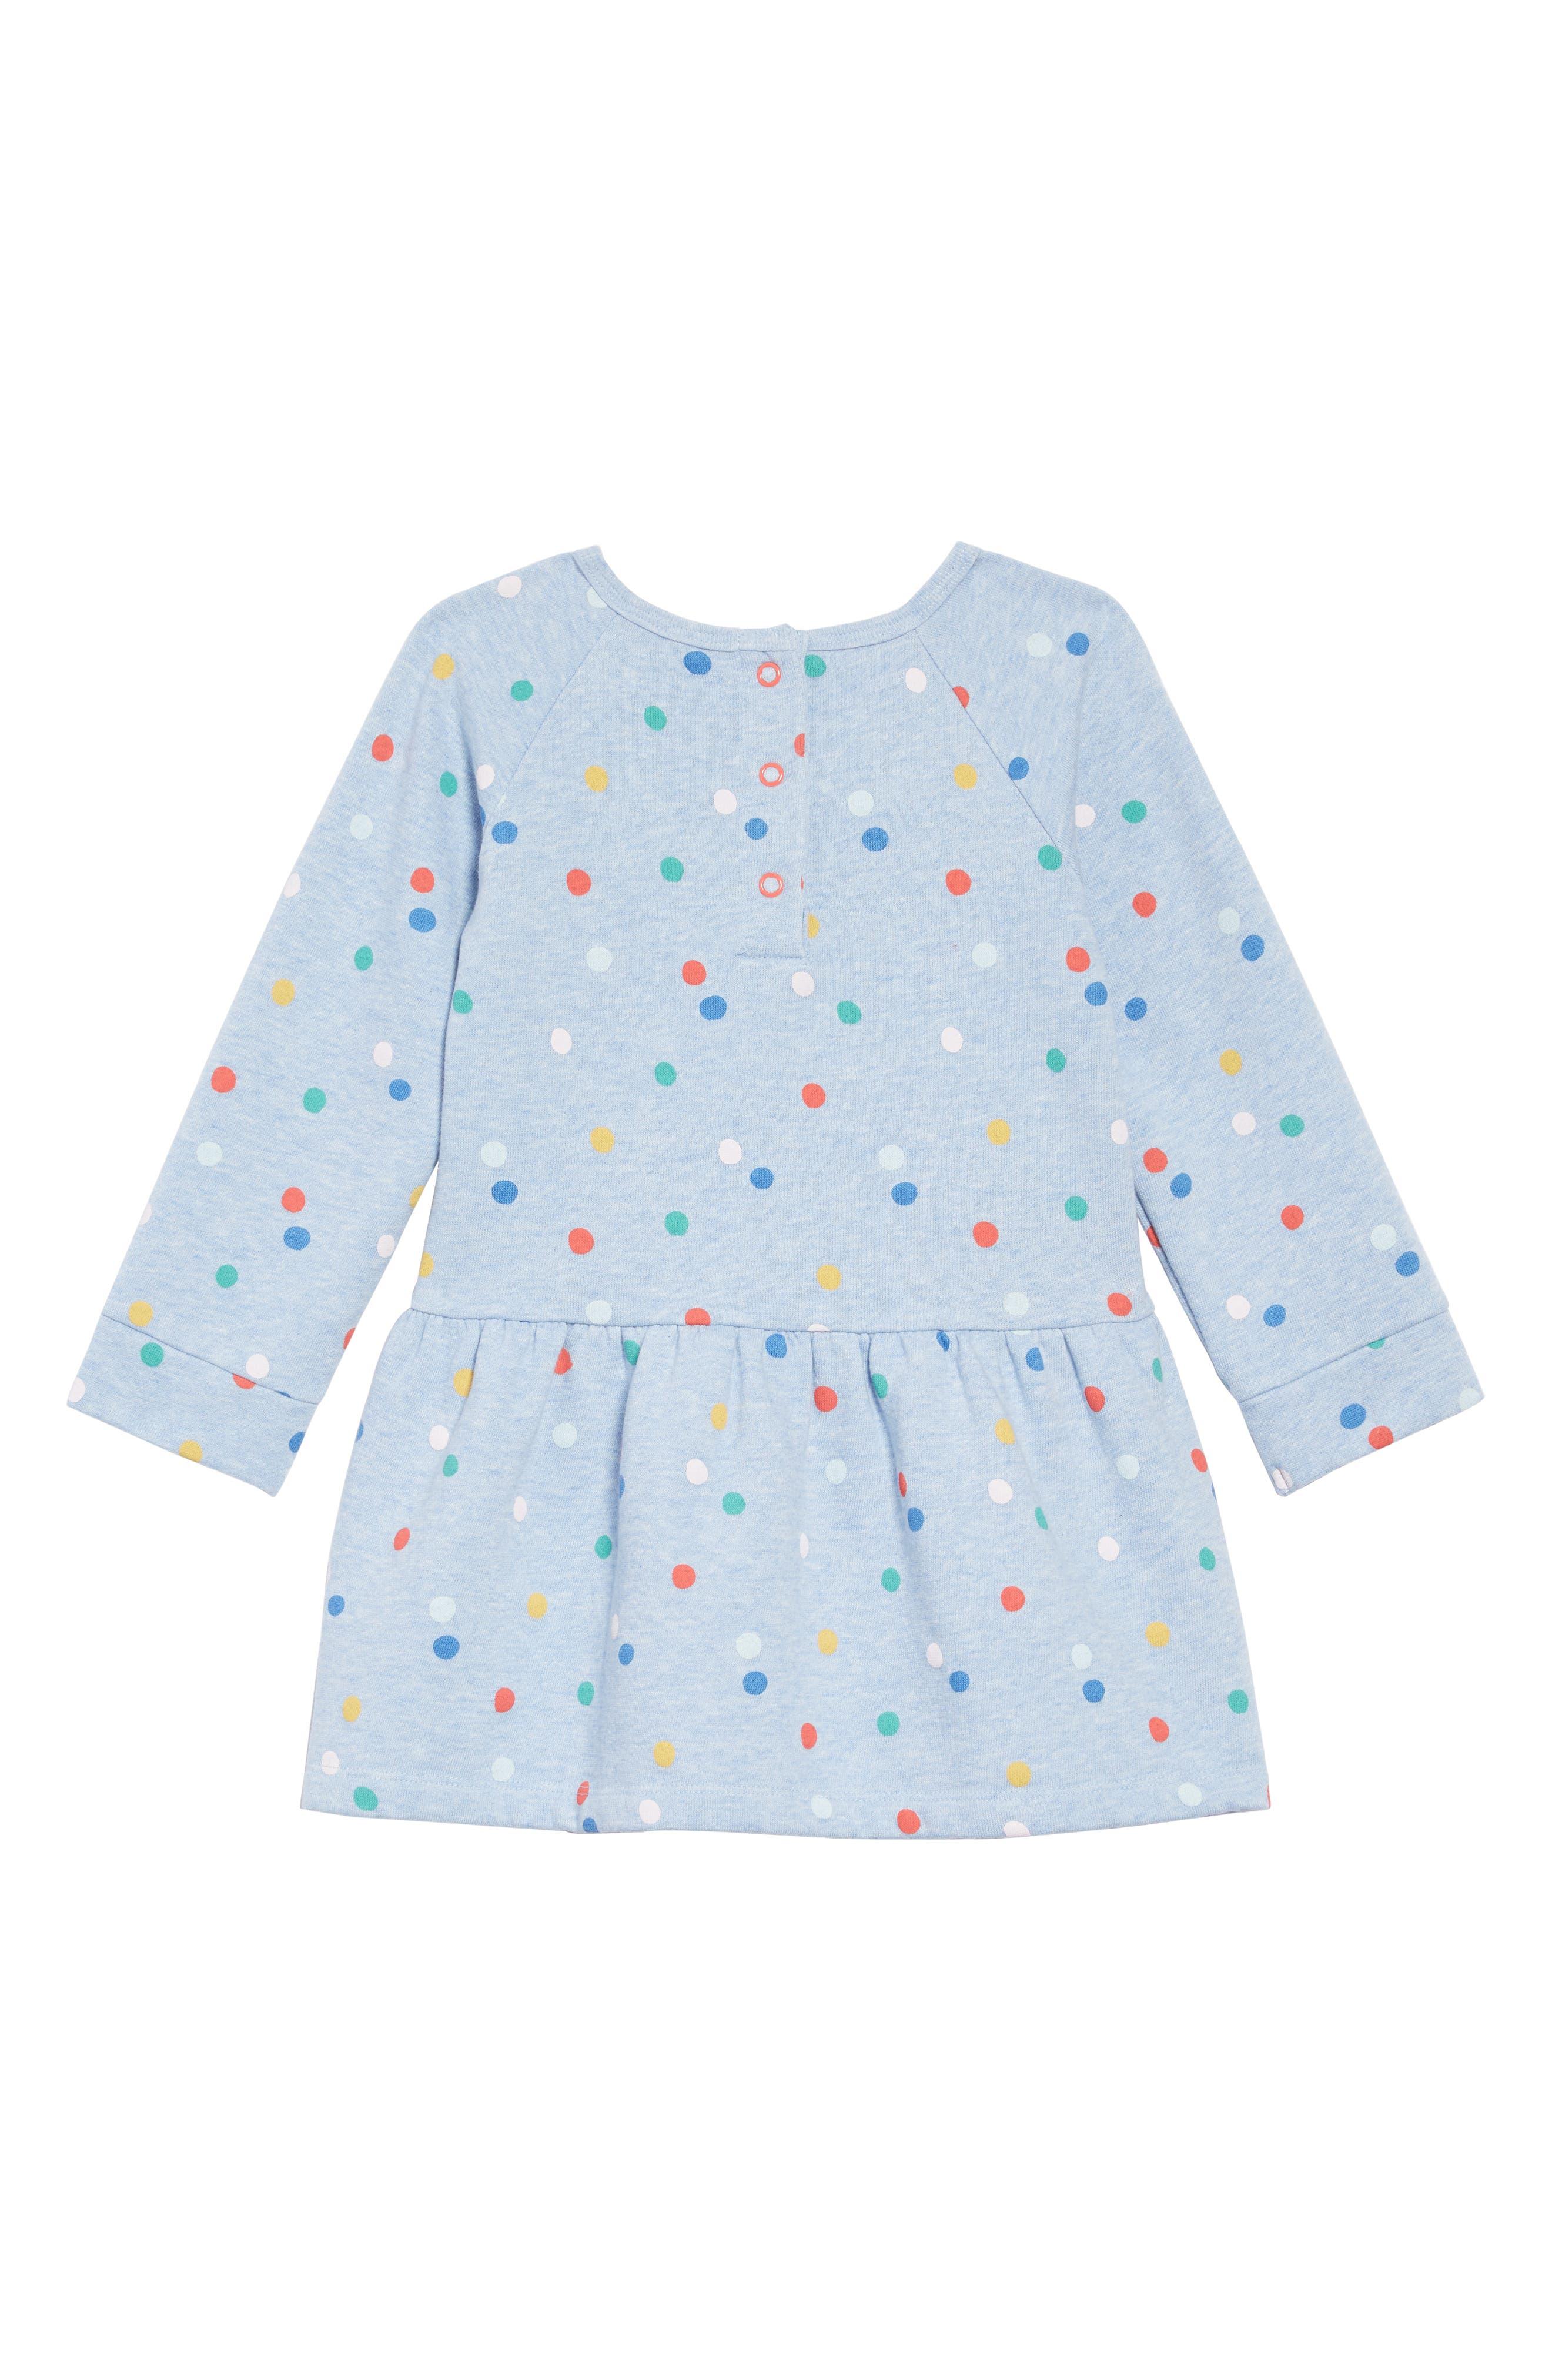 Colorful Cozy Dress,                             Alternate thumbnail 2, color,                             MUL MULTI PAINTED SPOT